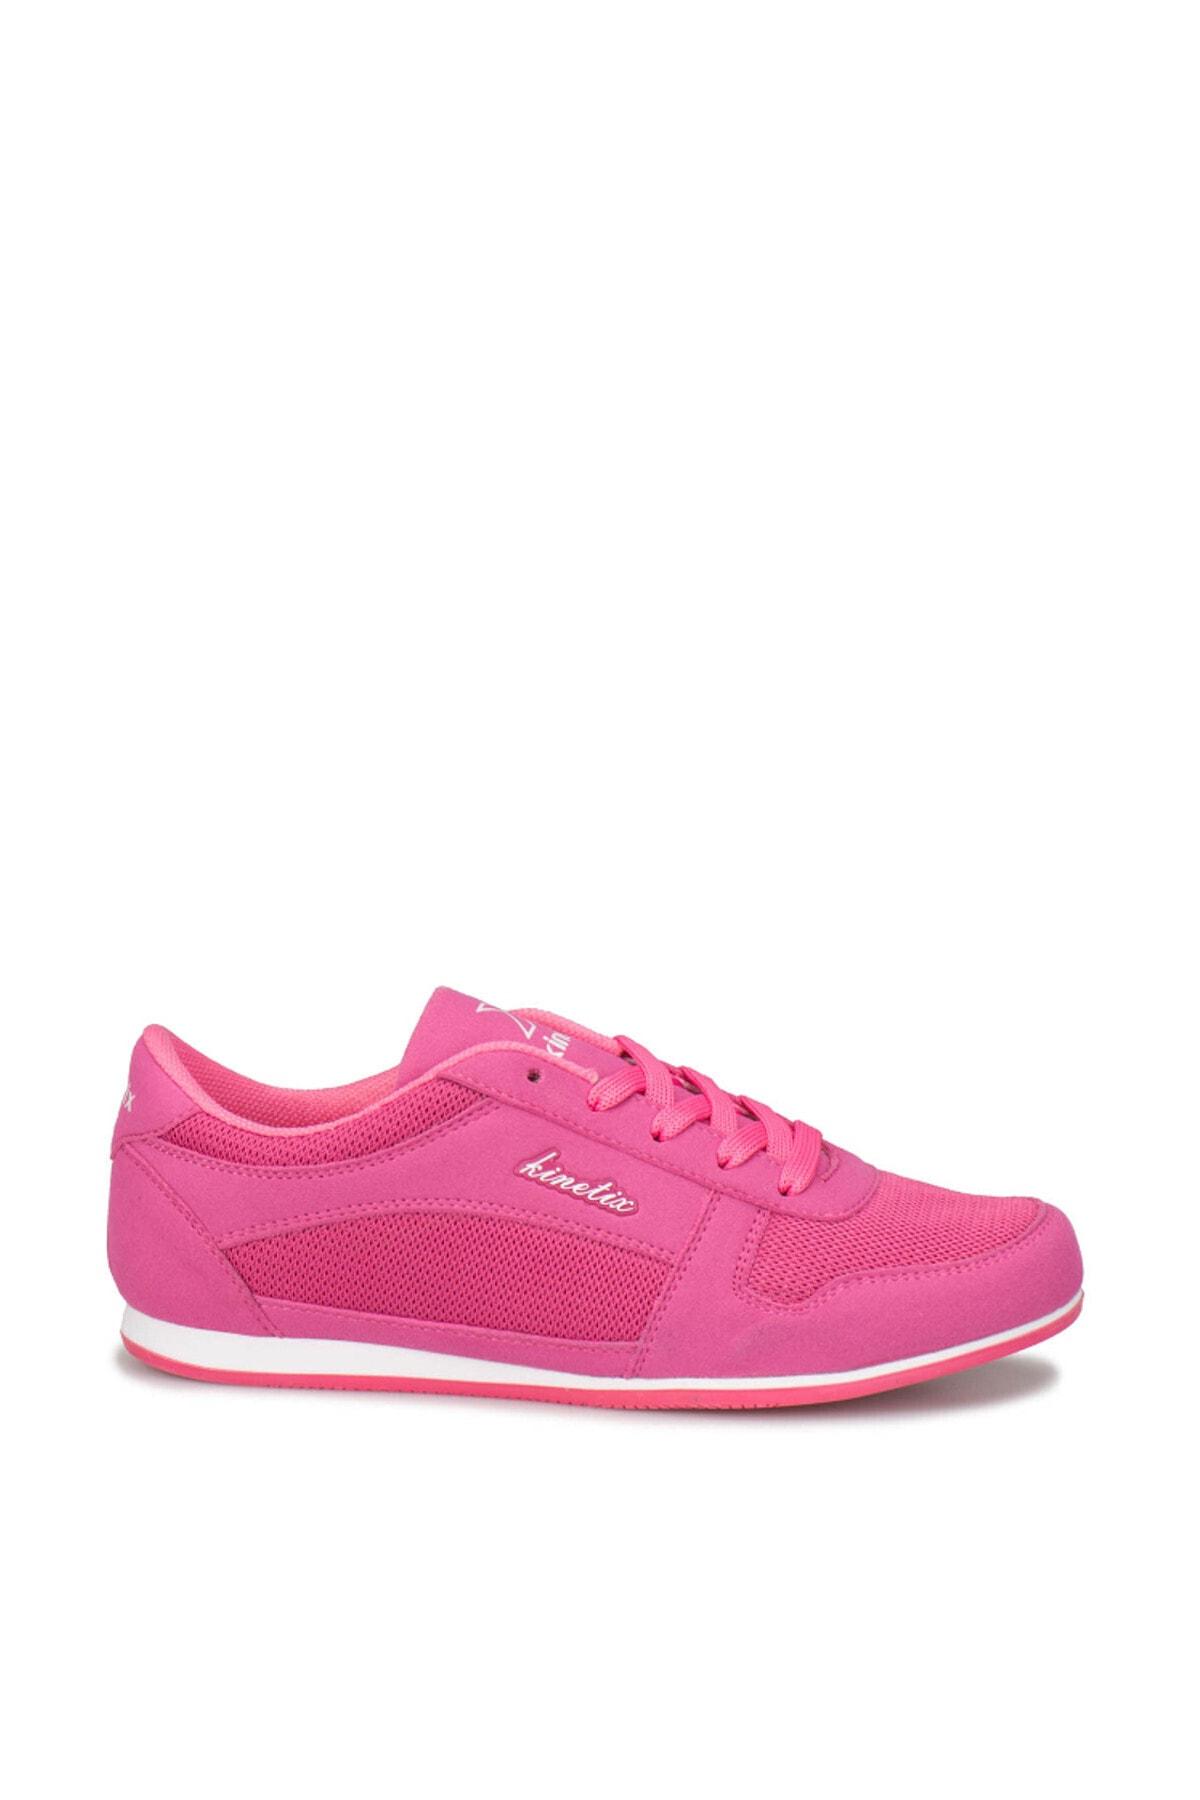 Kinetix LENY Fuşya Kadın Sneaker 100243507 2